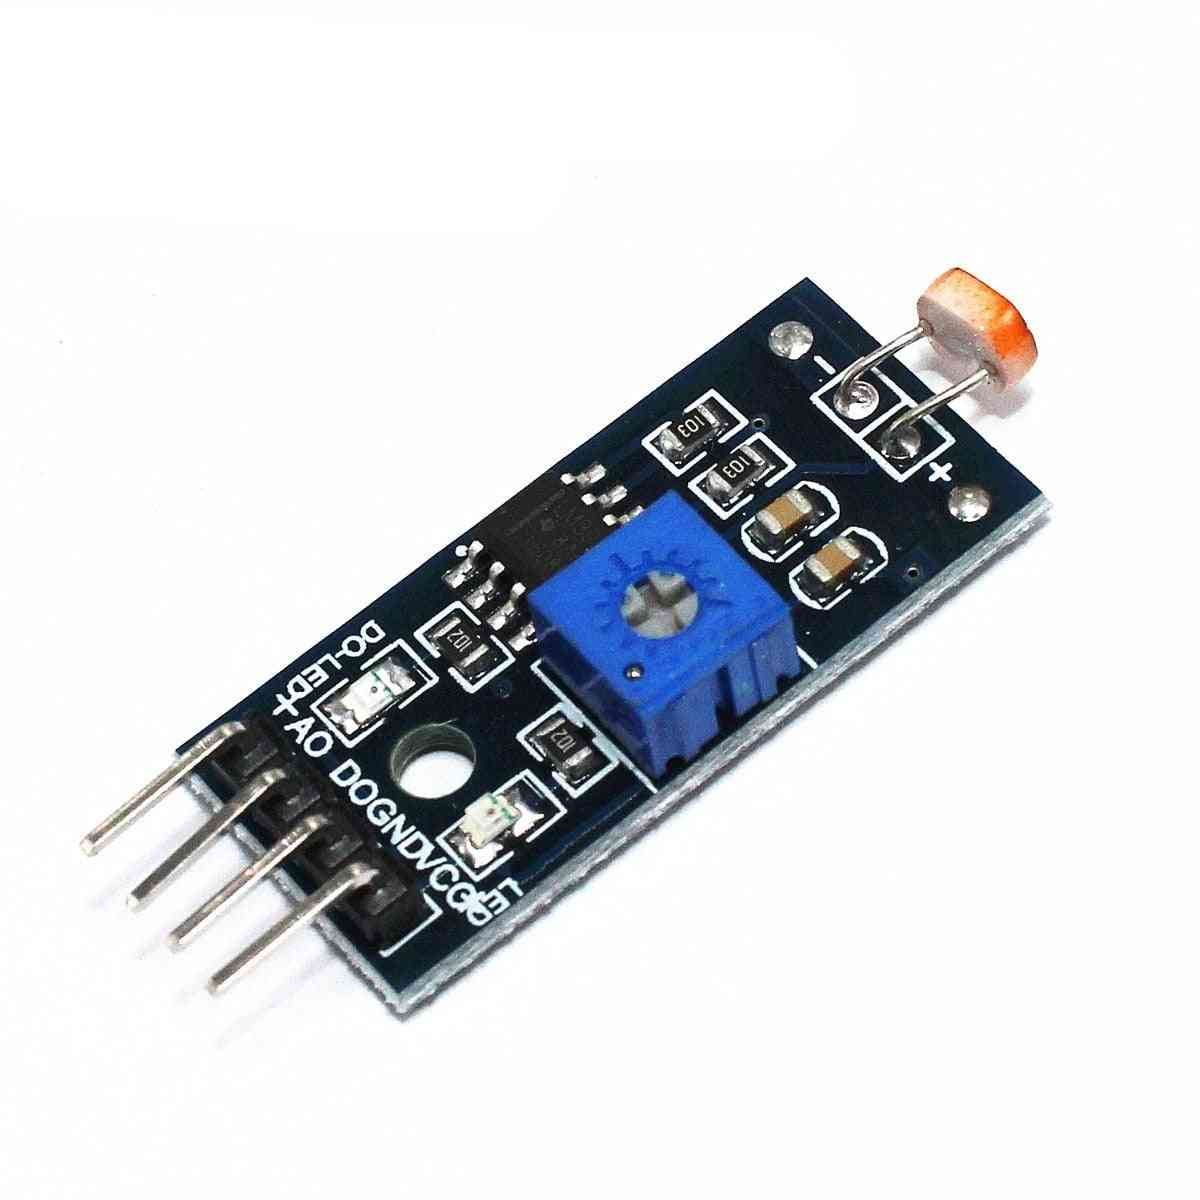 Photosensitive Brightness Resistance Sensor Module